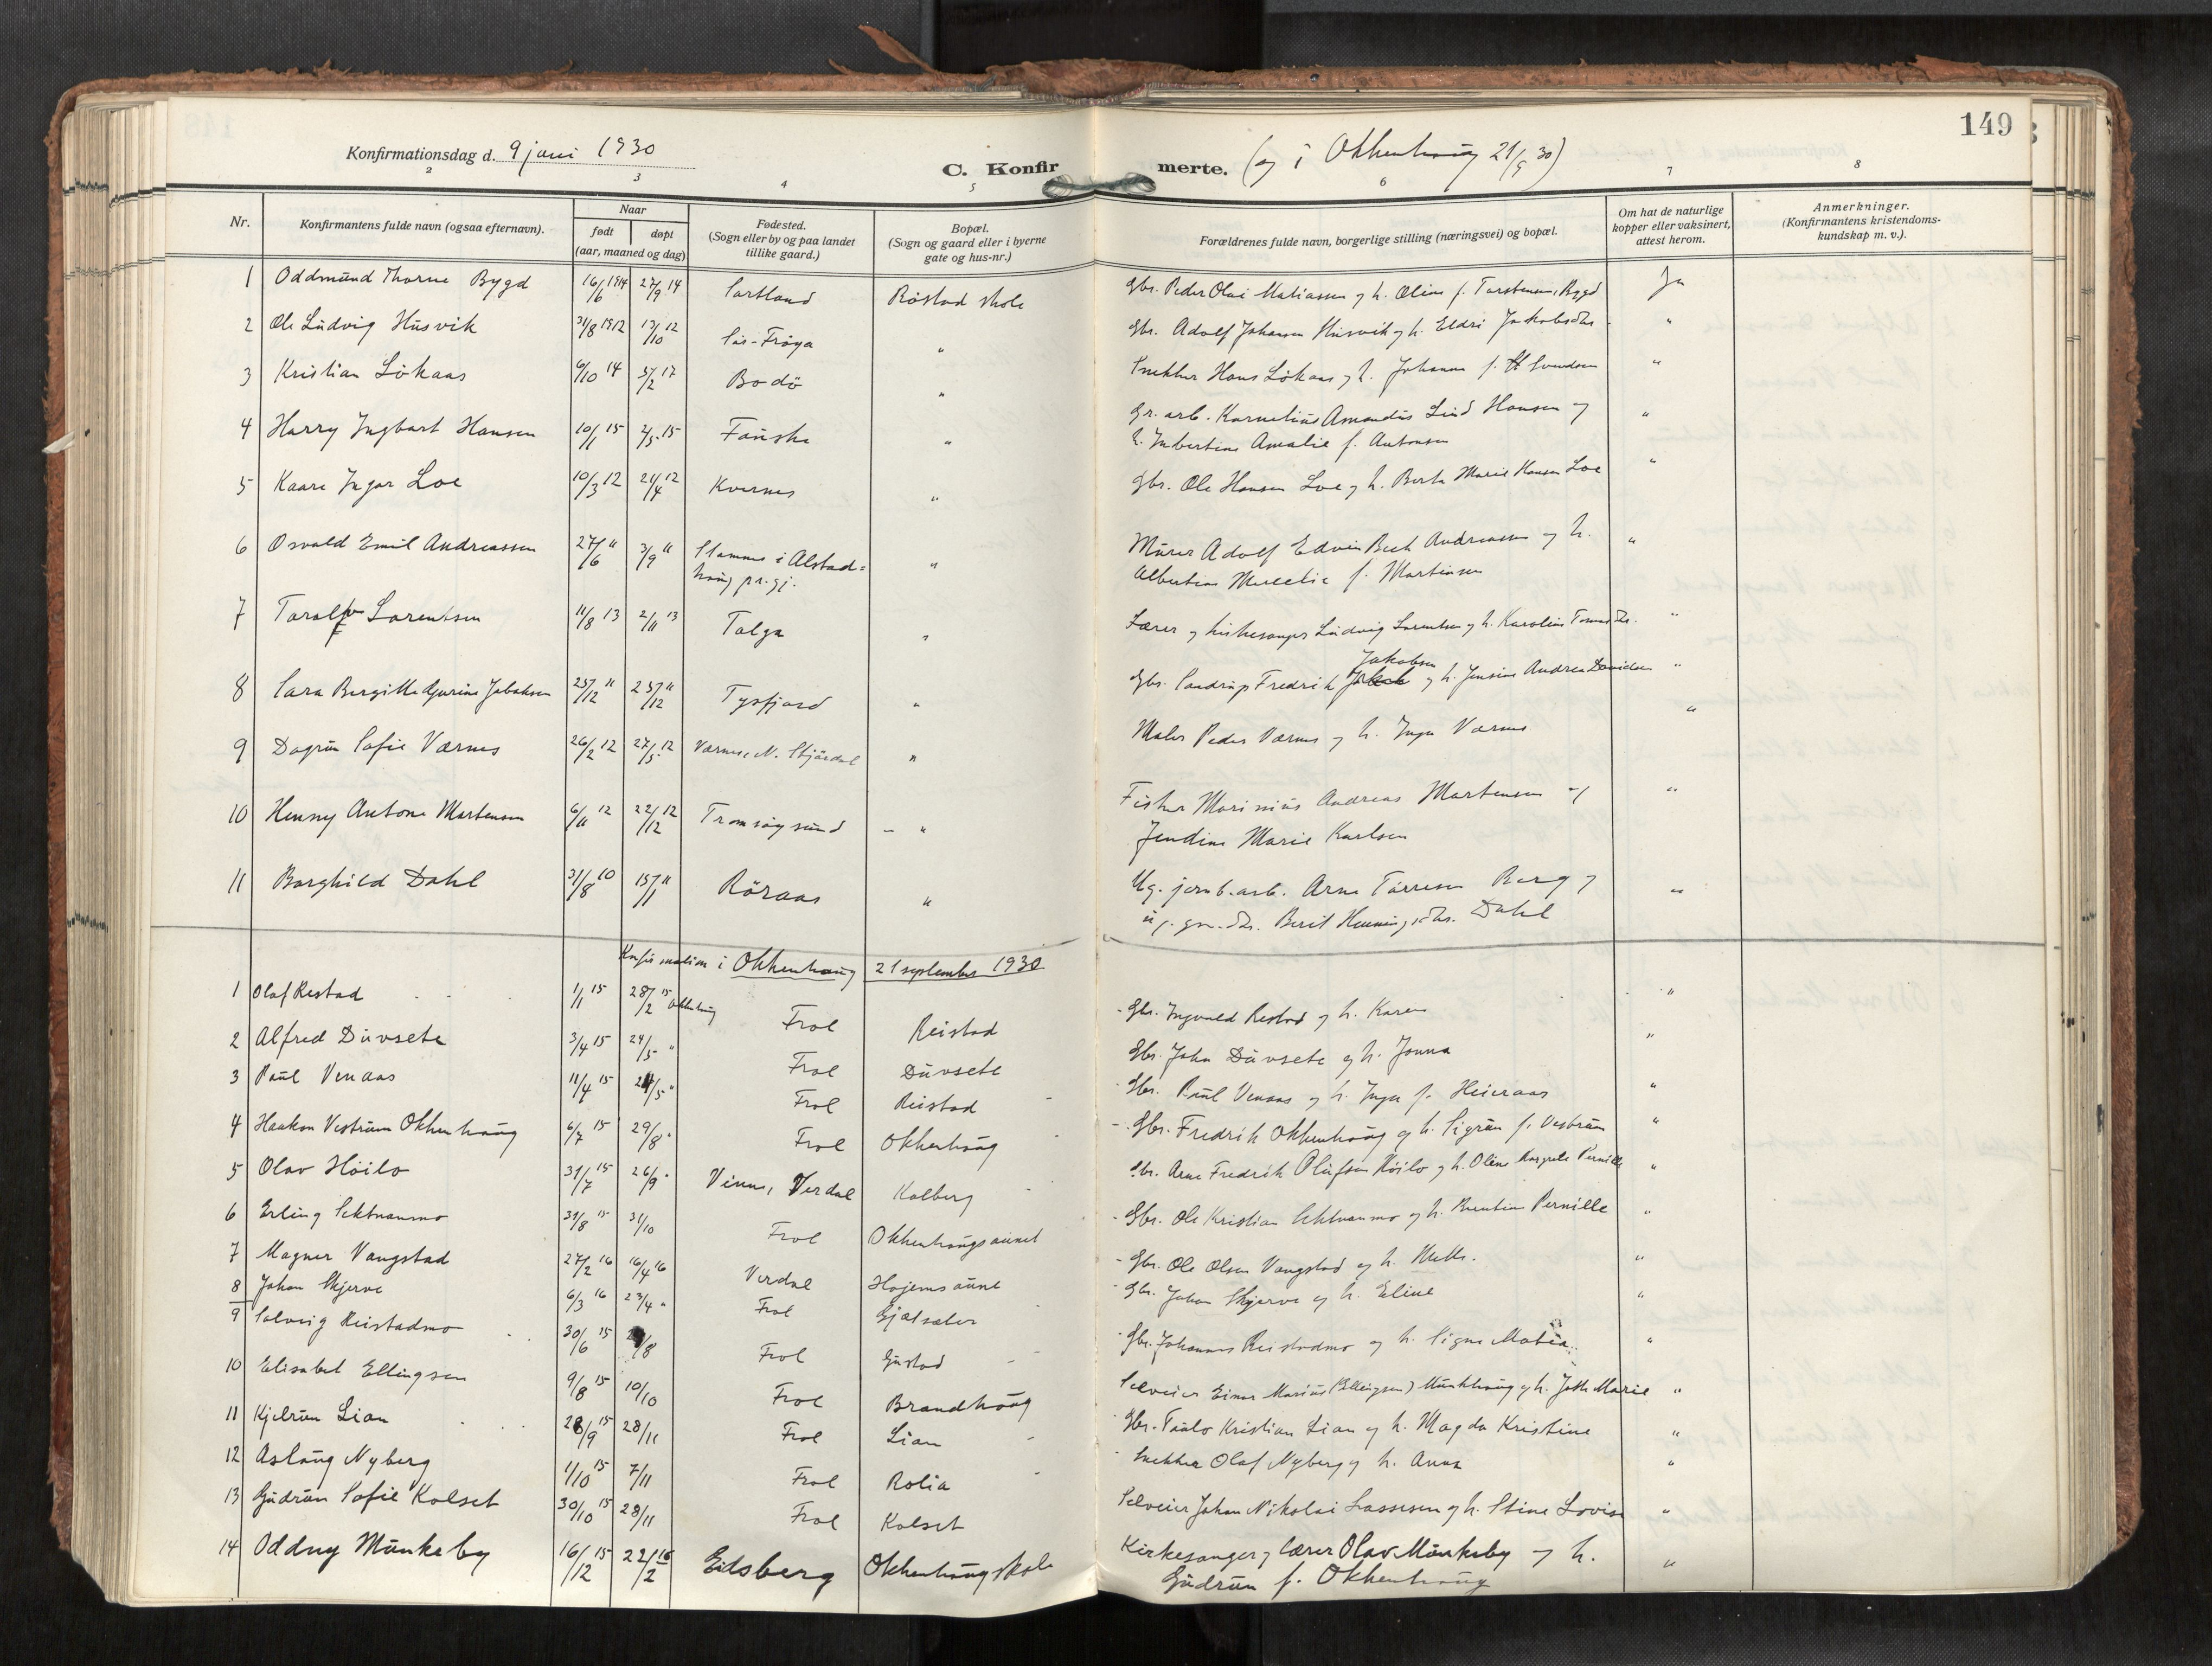 SAT, Levanger sokneprestkontor*, Parish register (official) no. 1, 1912-1935, p. 149